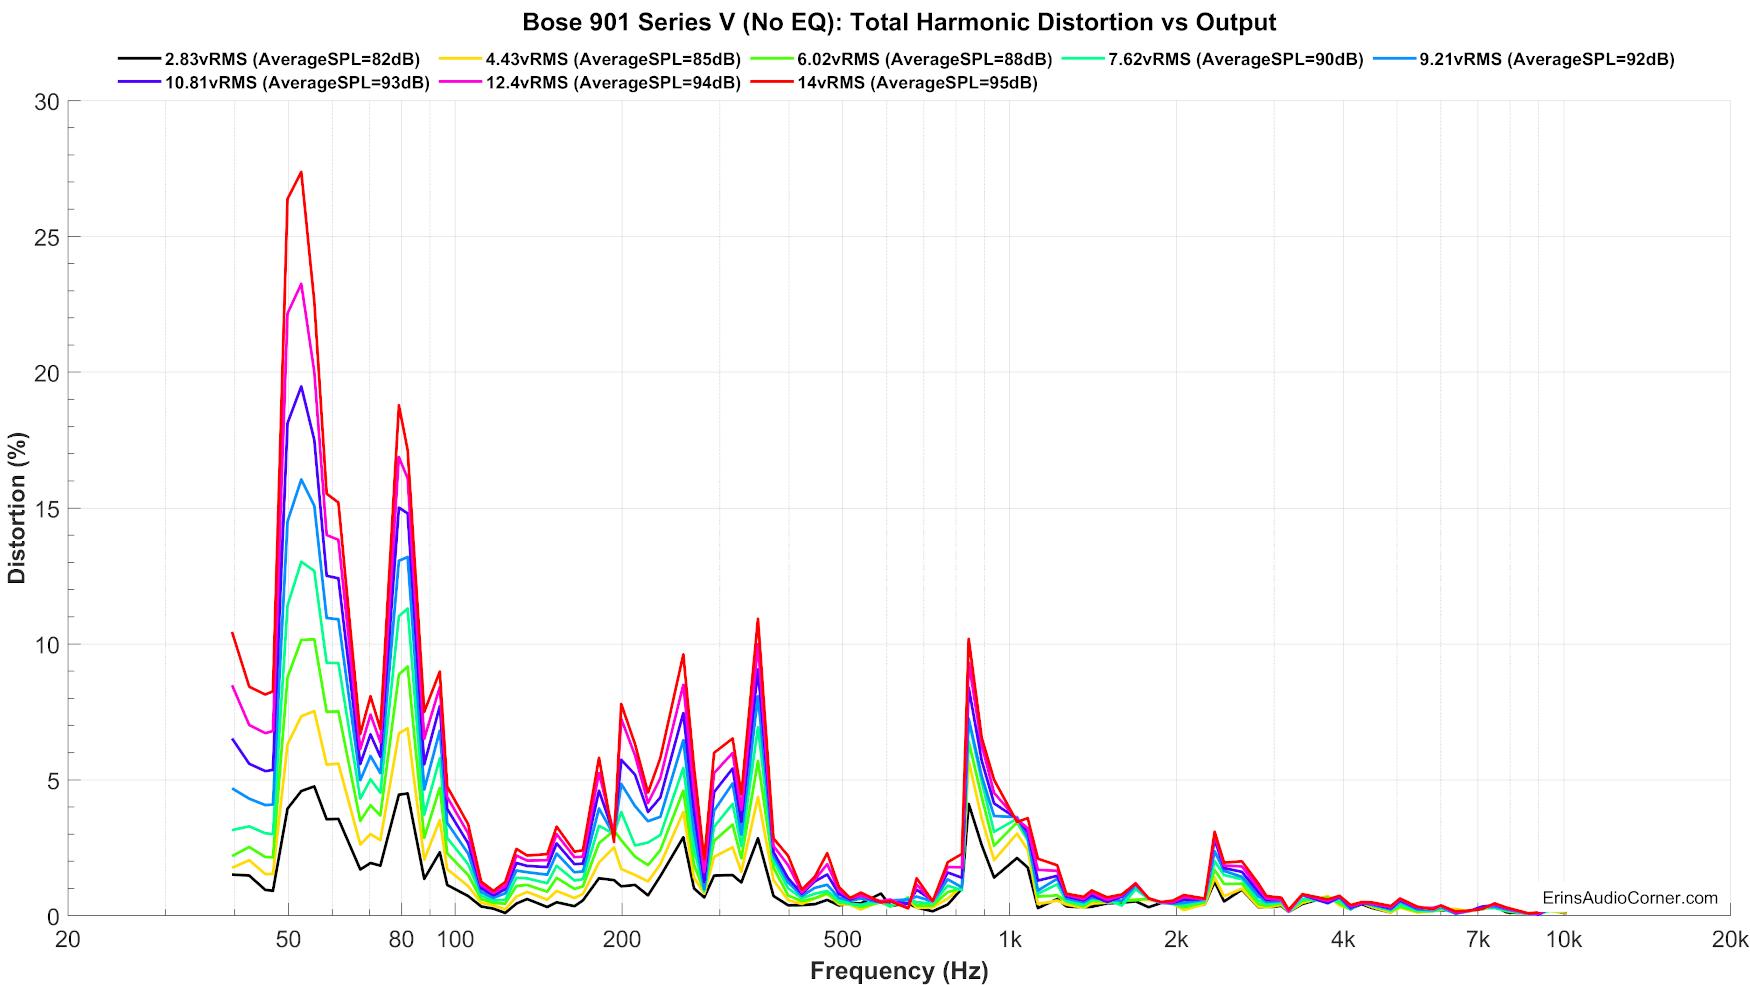 Bose%20901%20Series%20V%20(No%20EQ)_harmonicDistortion_linear.png